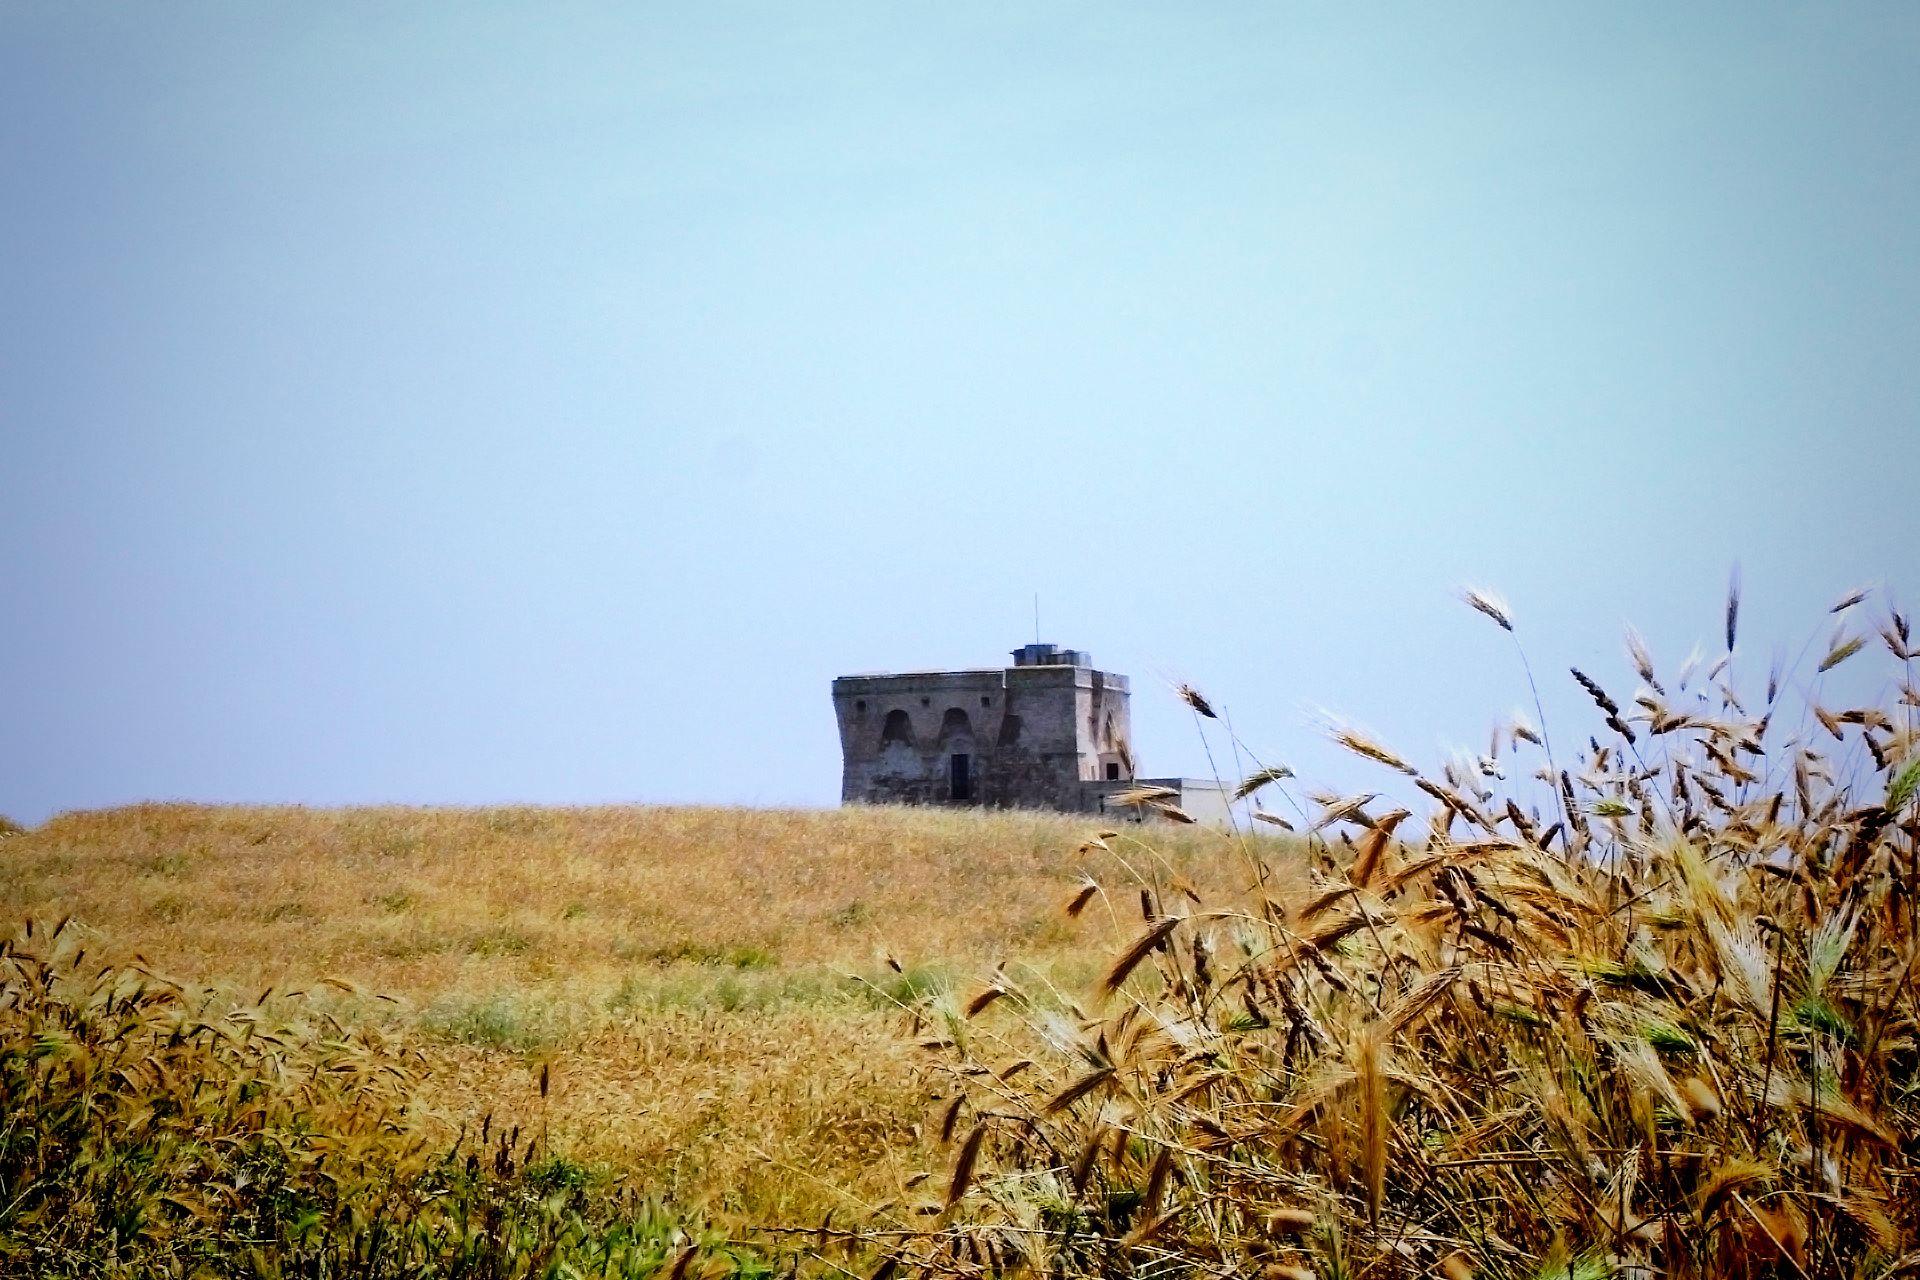 apulia-slow-travel-hiking-tour-torre-guaceto-XVI secolo-prateria-distesa-grano-cereali-riserva-naturale-puglia-apulien.apulia-naturschutzgebiet-getreide-turm-watchtower-torre di avvistamento-grain-country yard-autumn-herbst-autunno